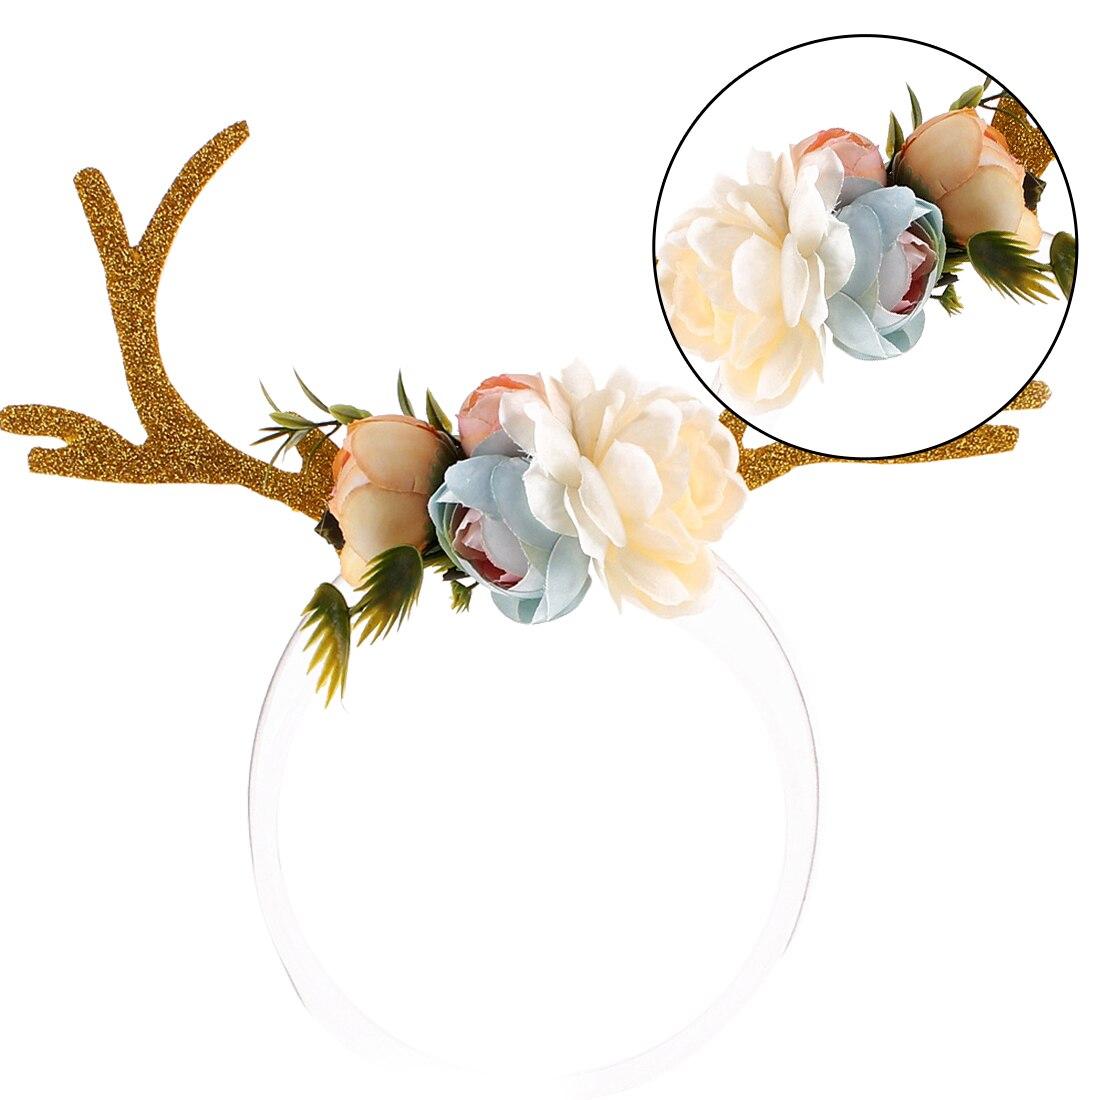 Charming Headband Gift Women Girls Christmas Deer Antlers Costume Ear Party Hair Floral Hairband